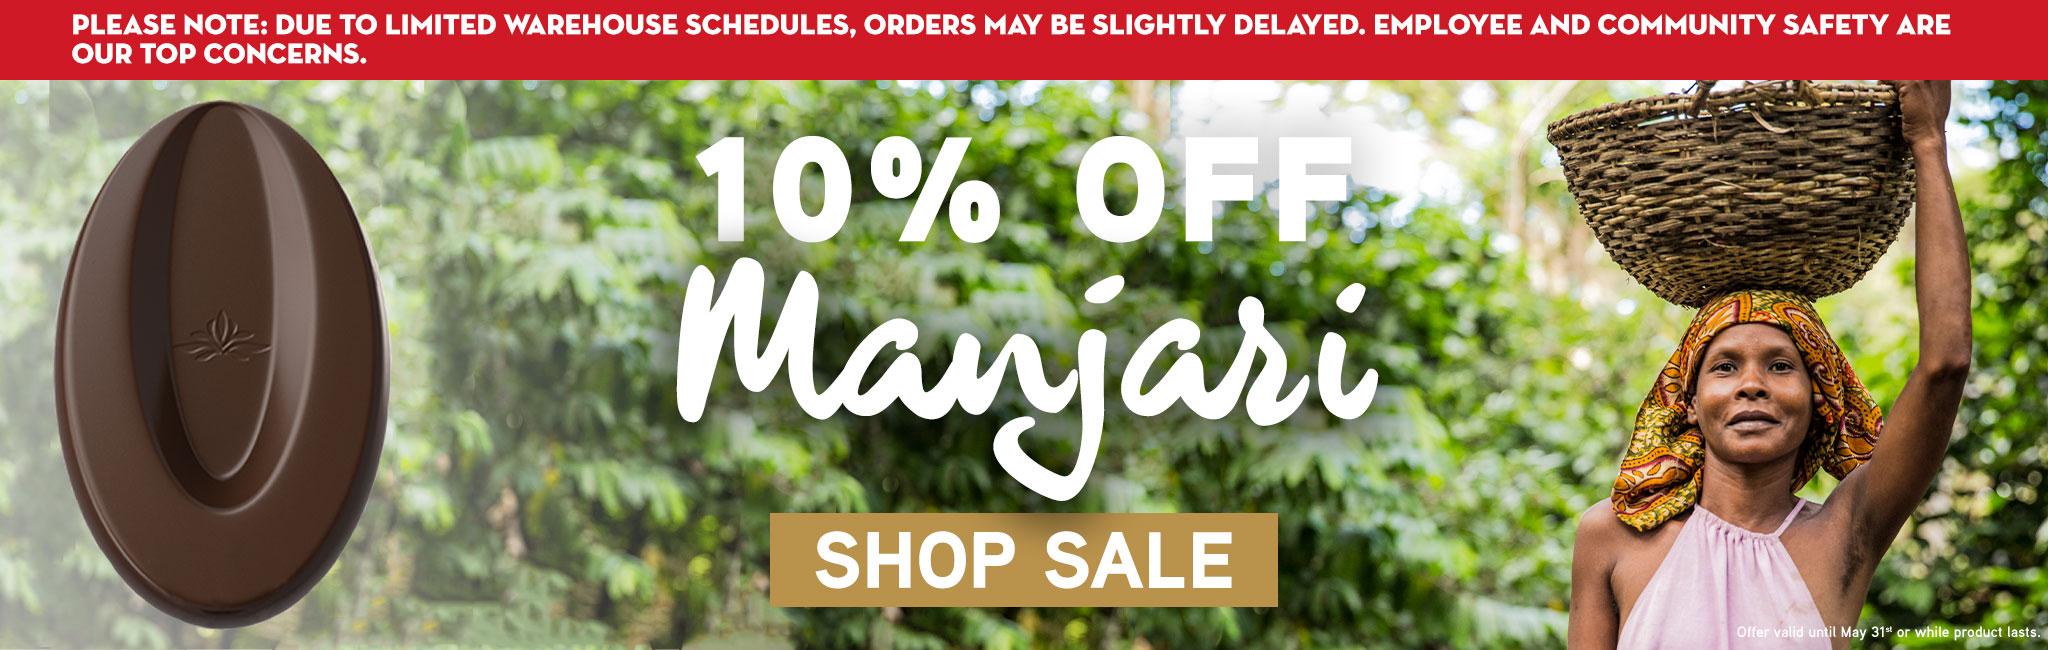 MANJARI DARK CHOCOLATE 10% OFF